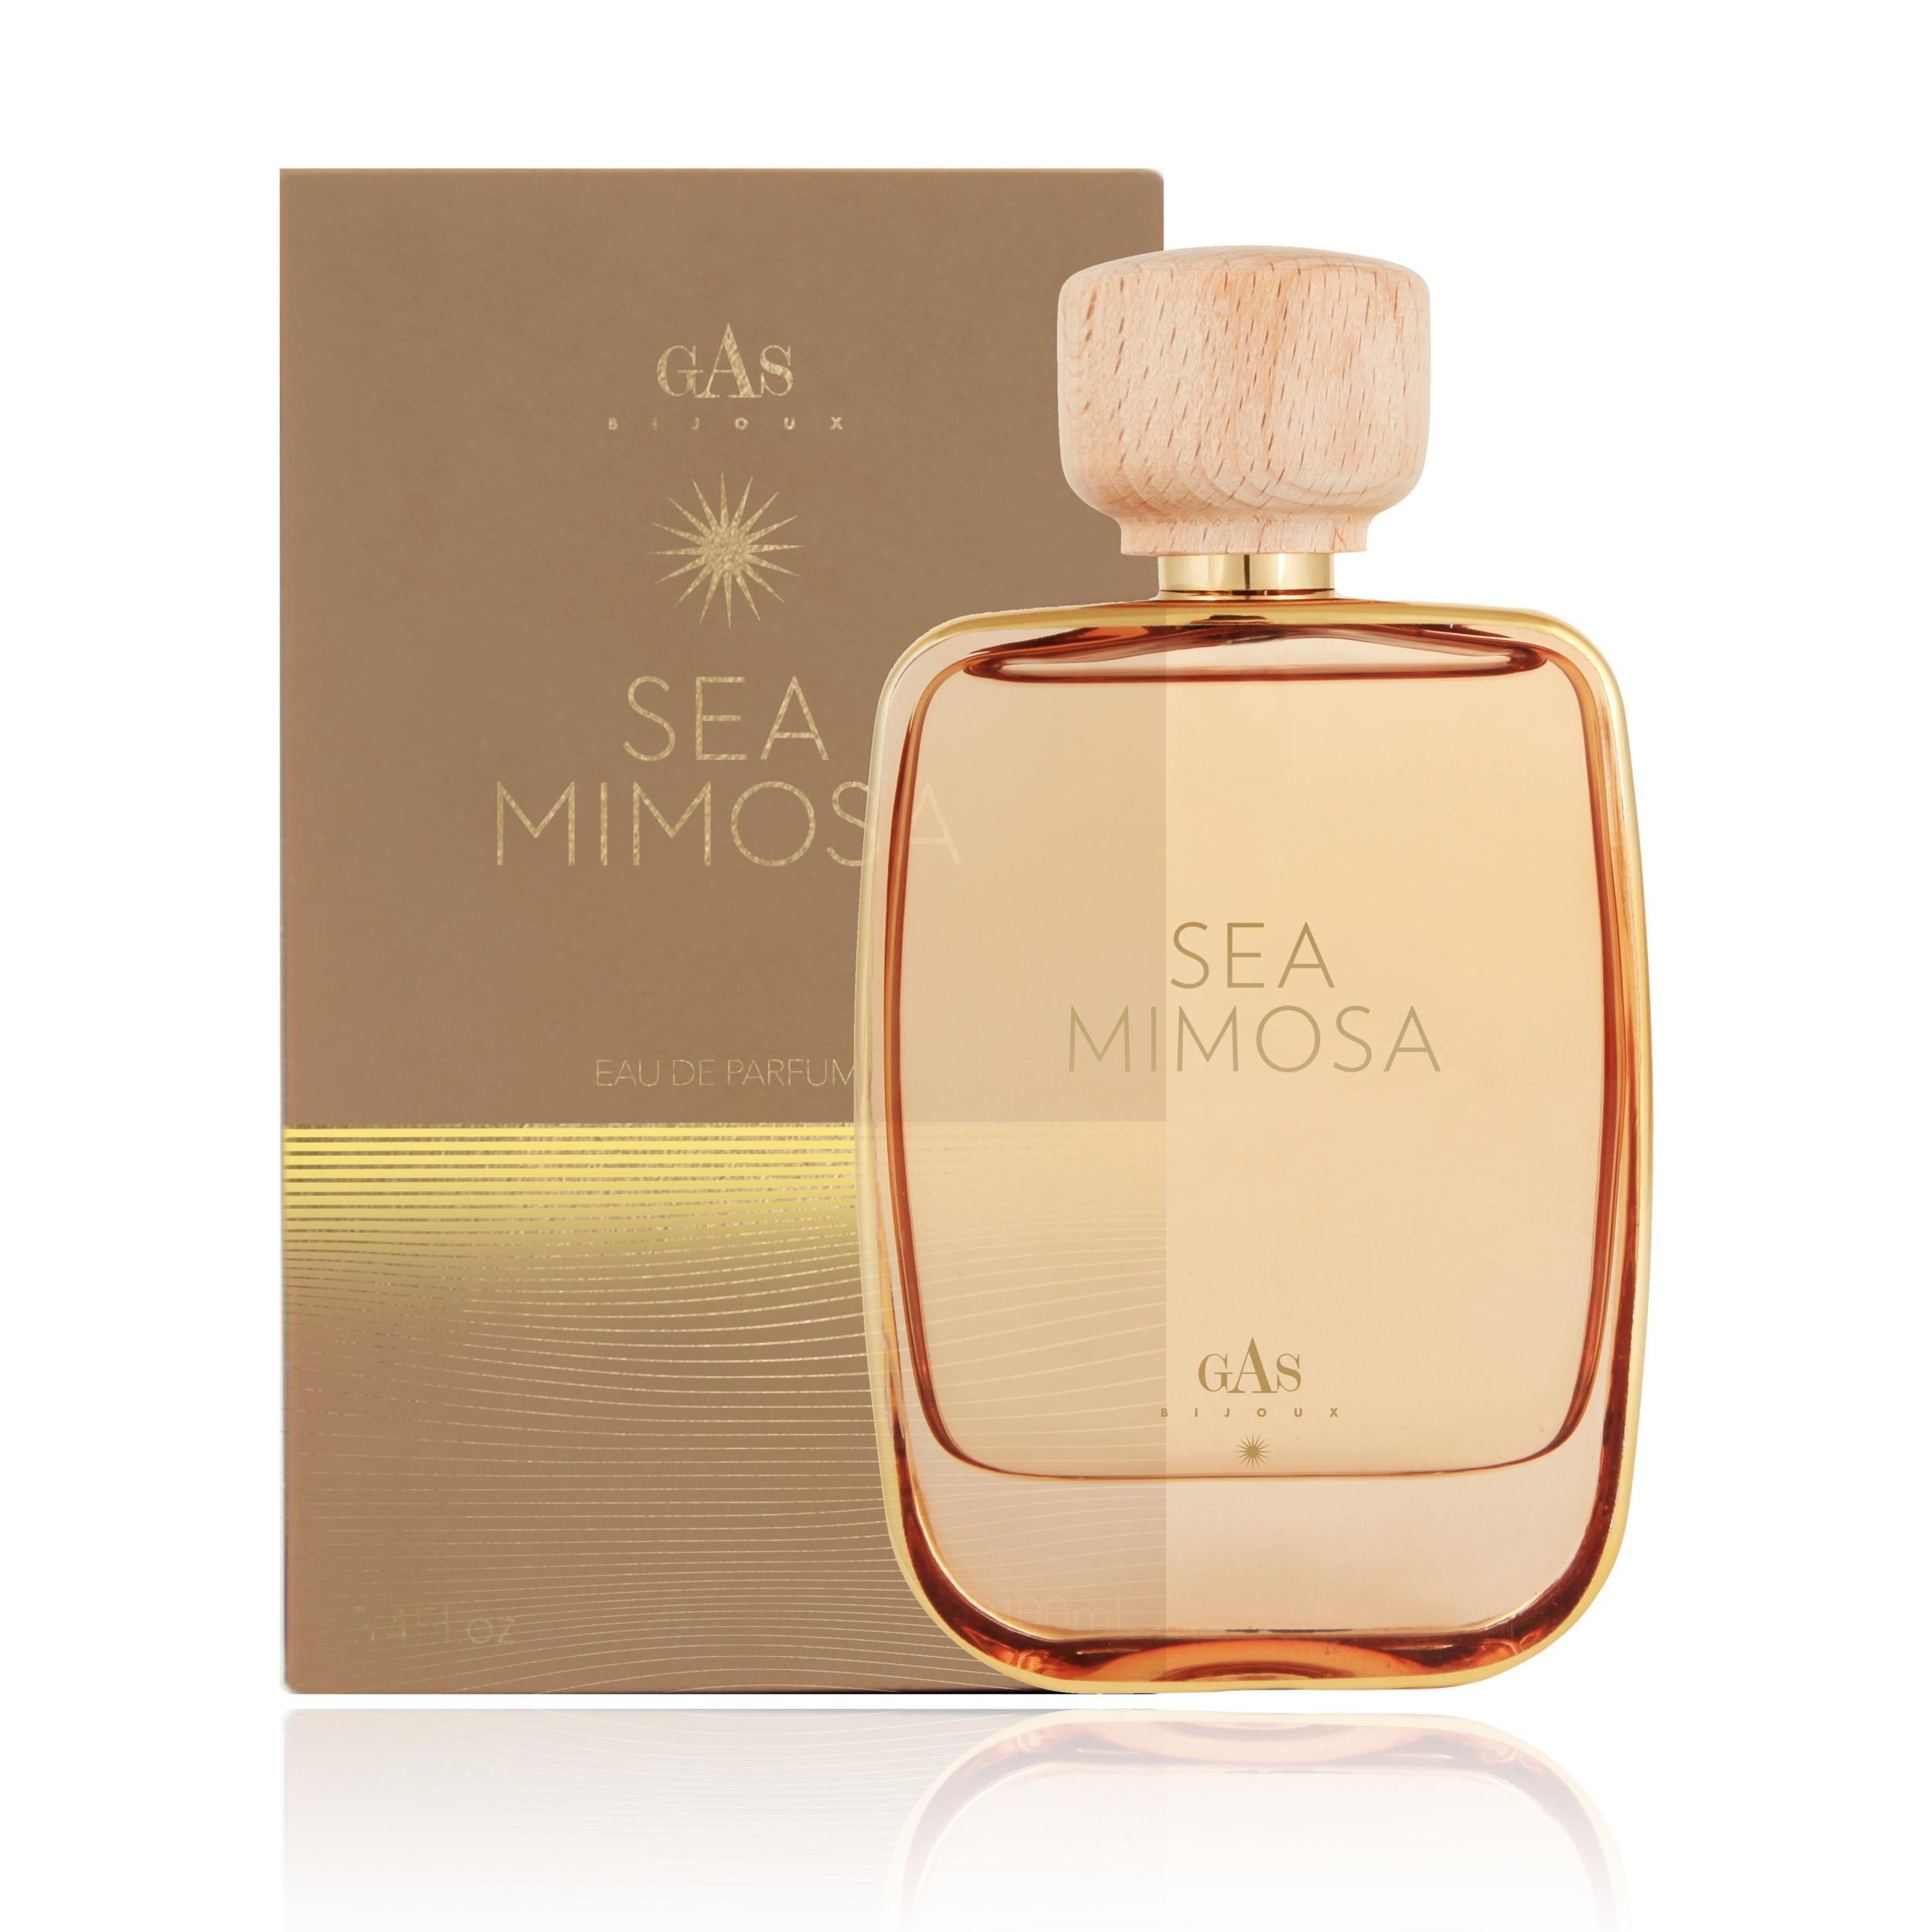 PARFUM_GAS_SEA_MIMOSA_100ML